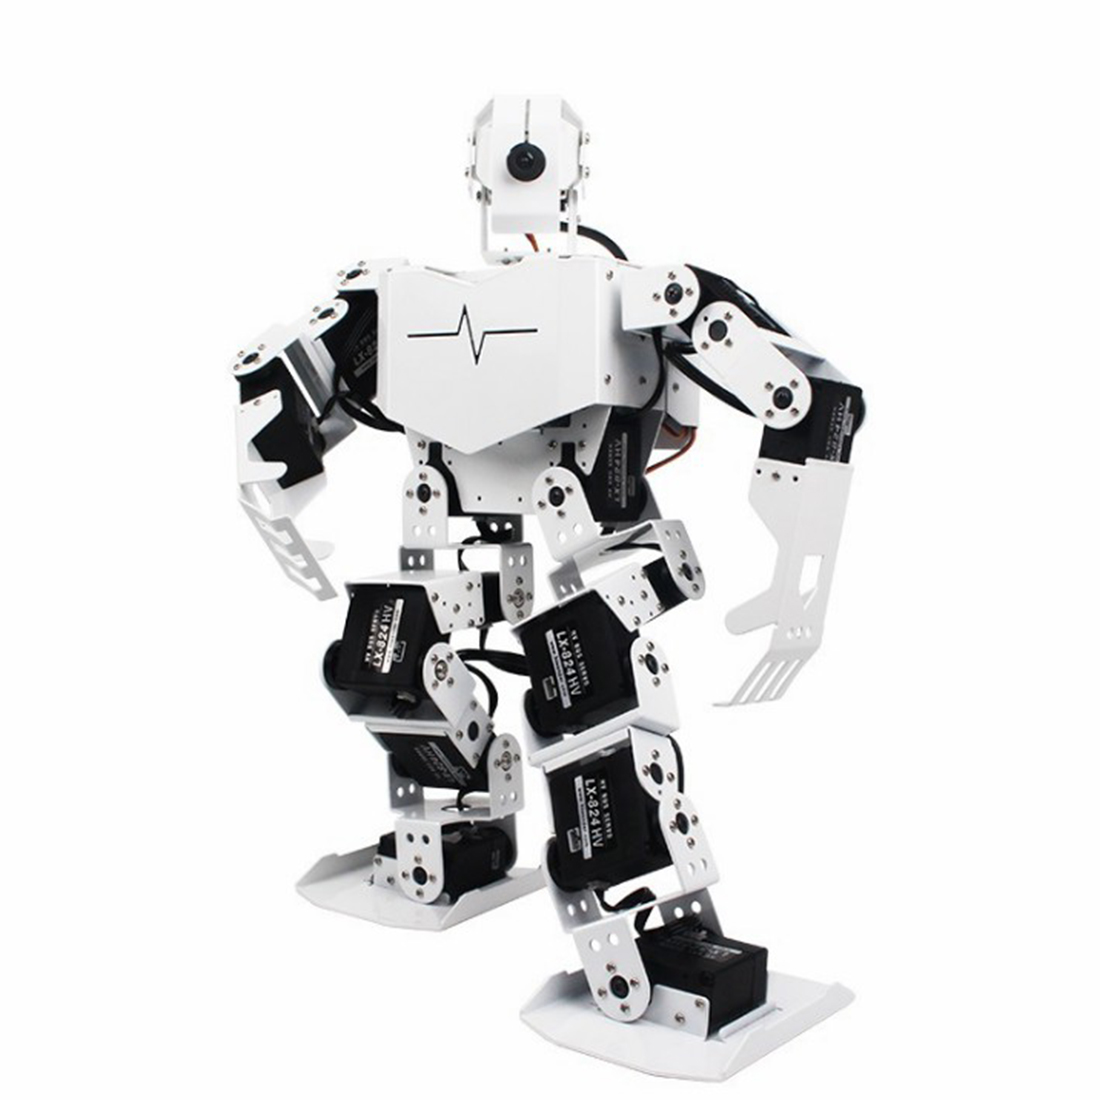 Humanoid Robot Raspberry-4b-2g WIFI Smart-Vision Video/programmable-Opencv Tonypi